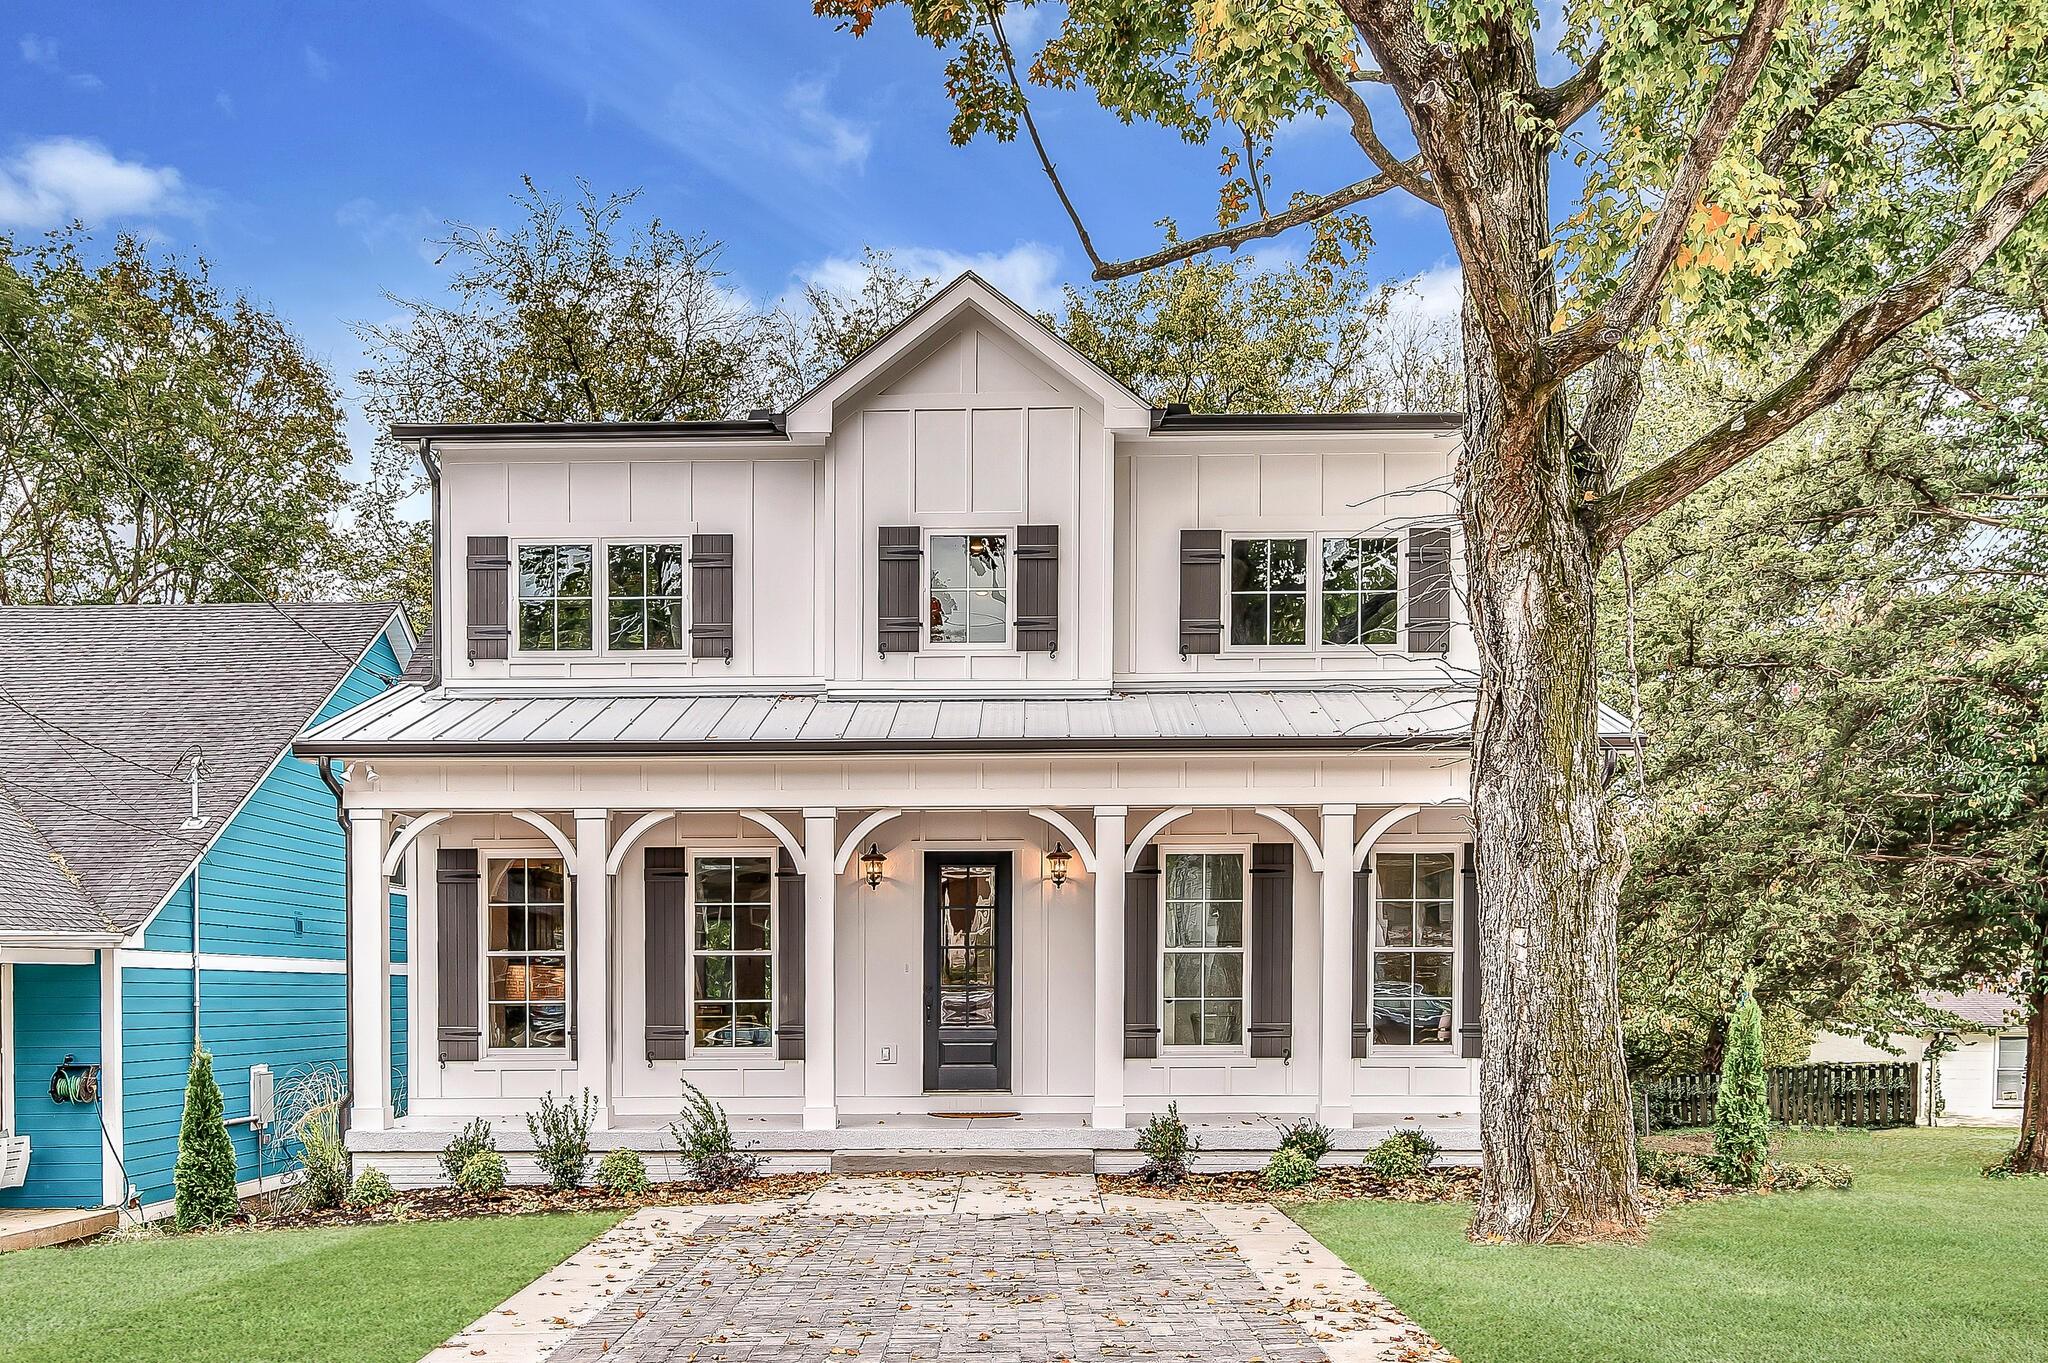 1022 Sharpe Ave Property Photo - Nashville, TN real estate listing